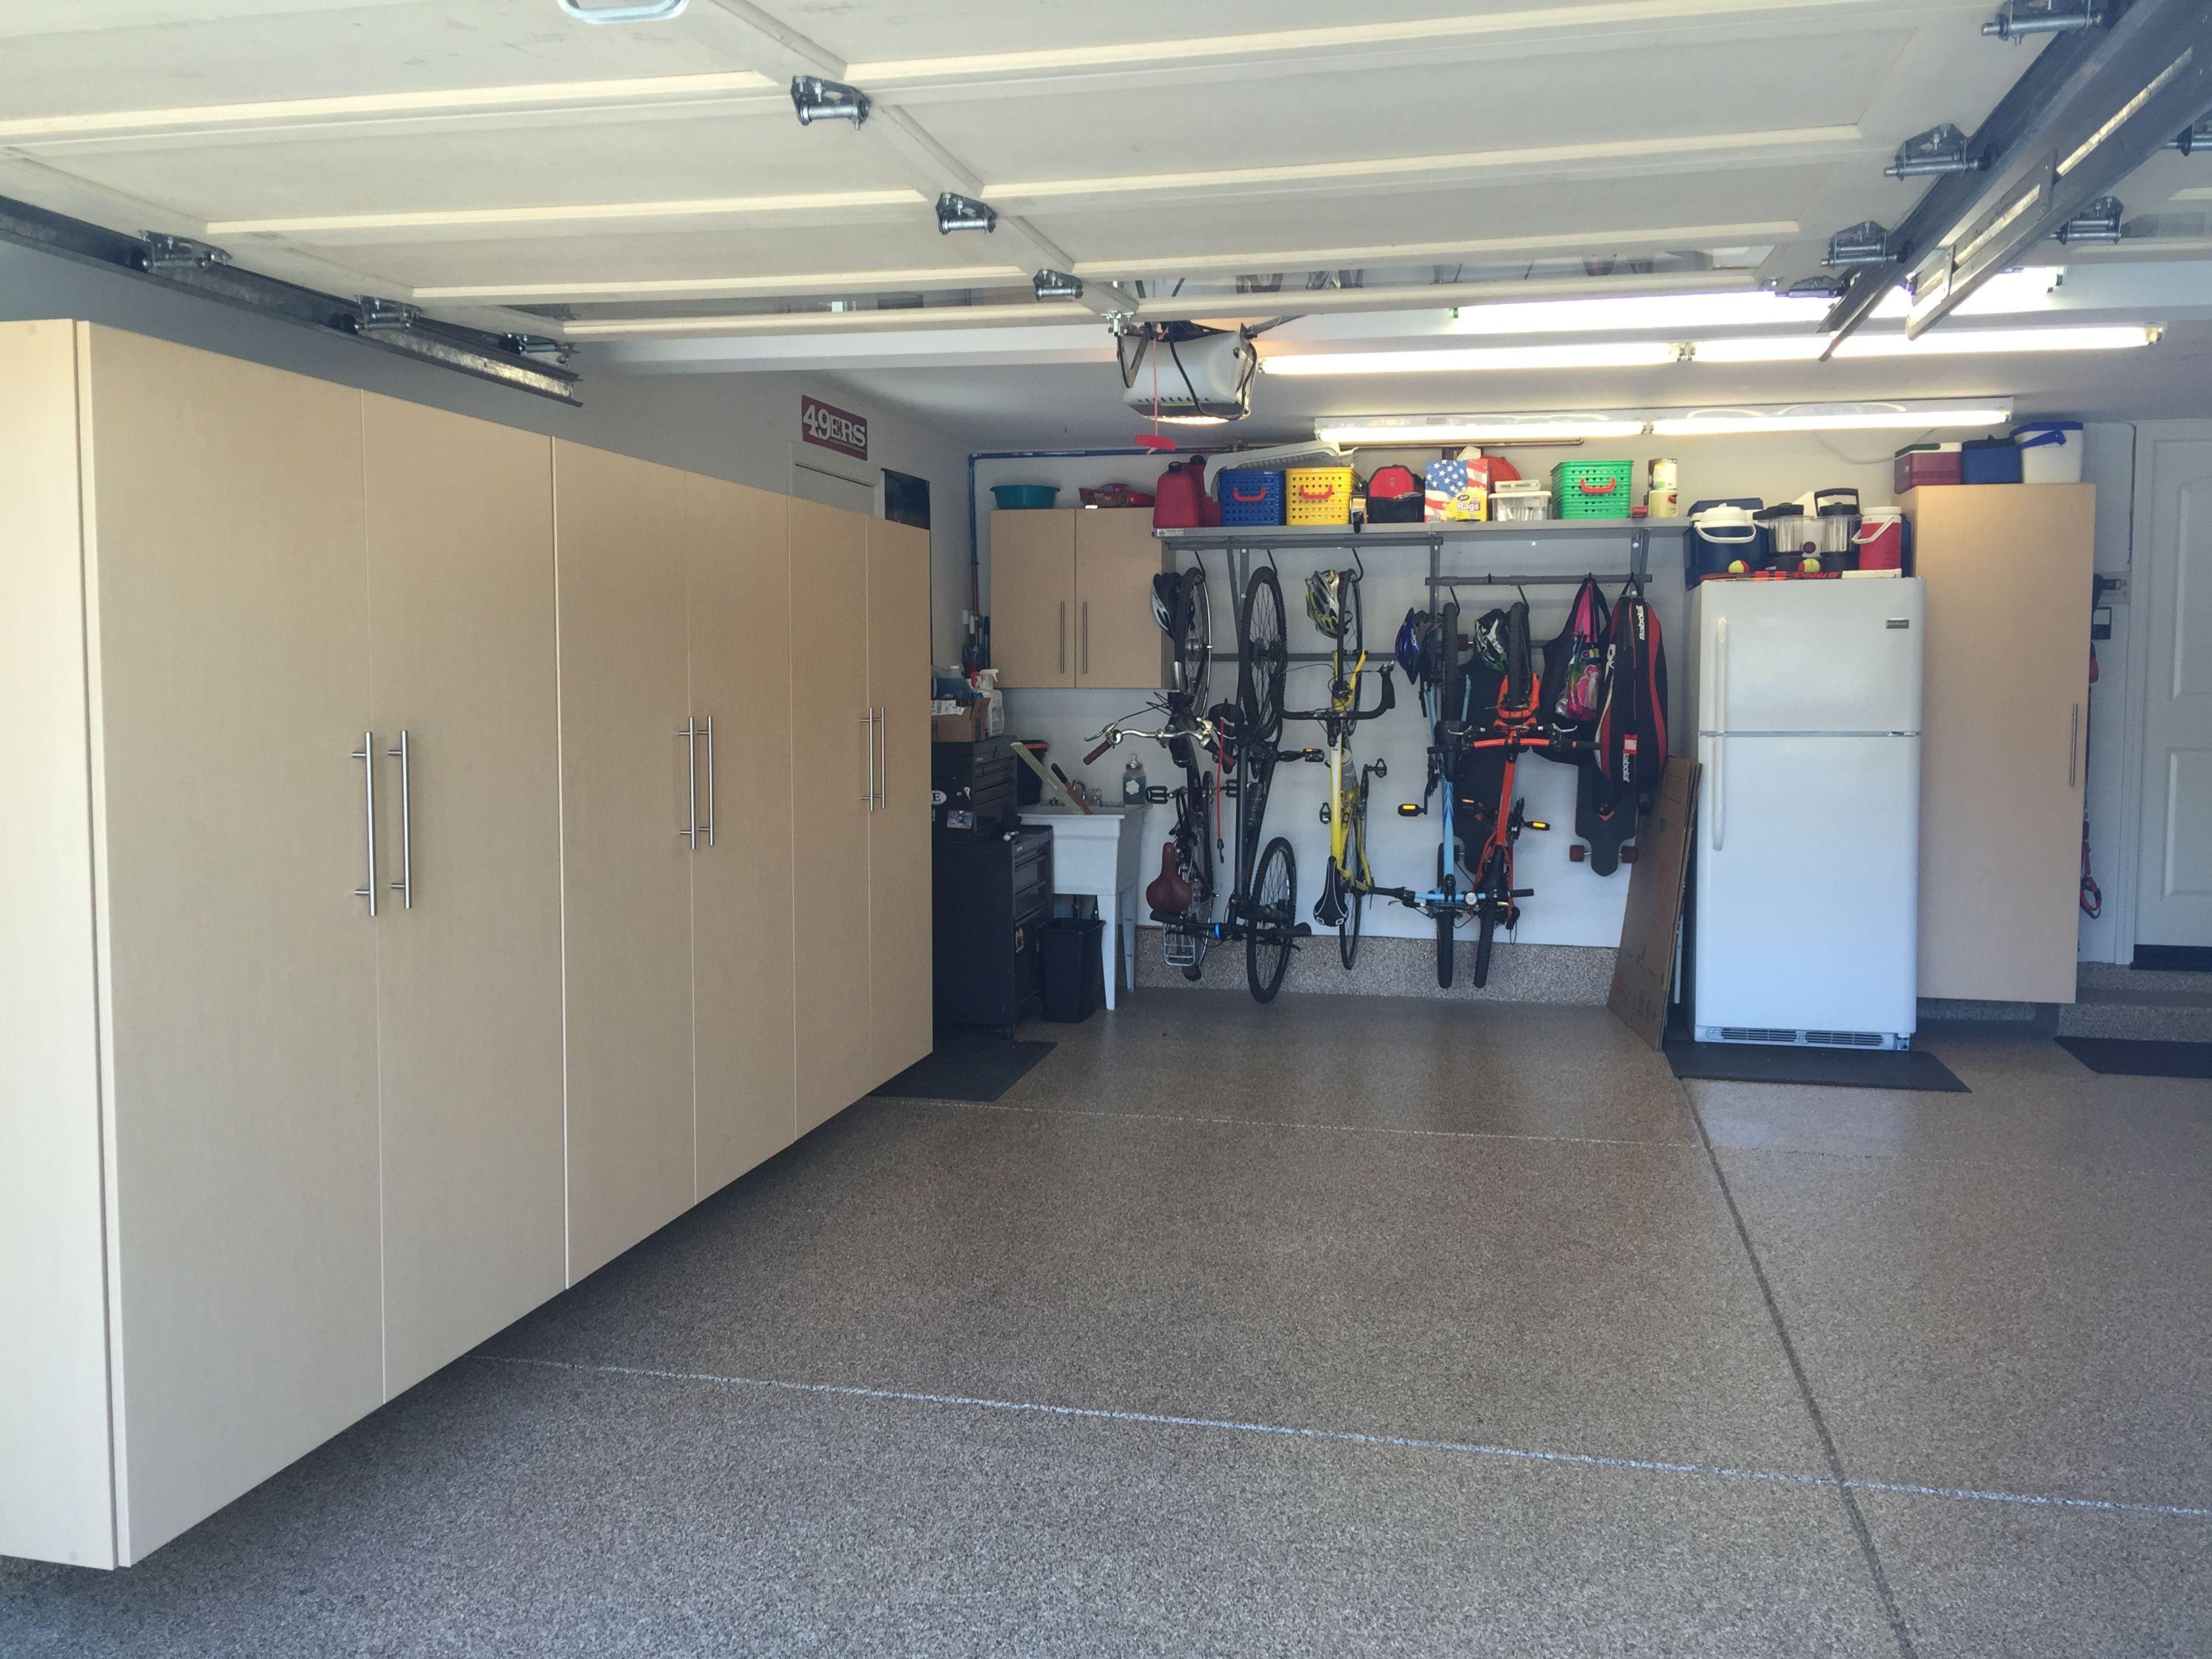 Garage Cabinets U0026 Organization Memphis, TN   Incognito Closets   Garage    Pinterest   Organisations